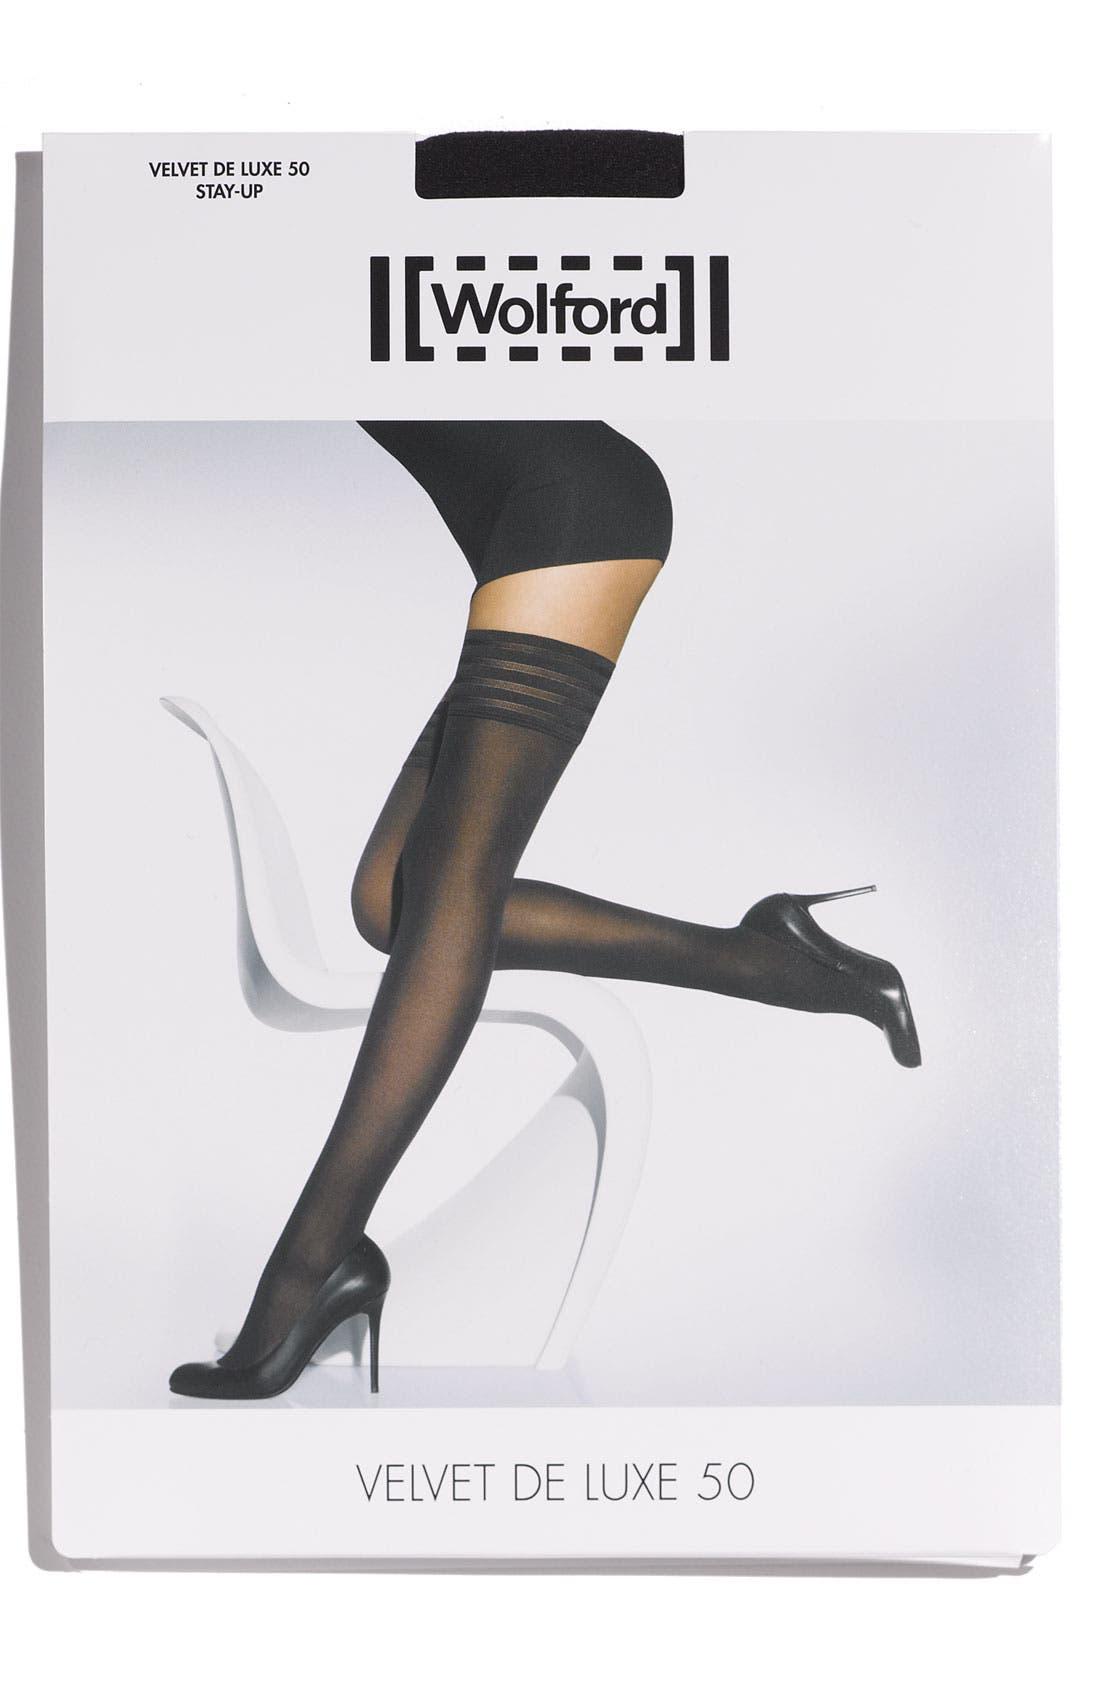 691e60276 Stockings All Women